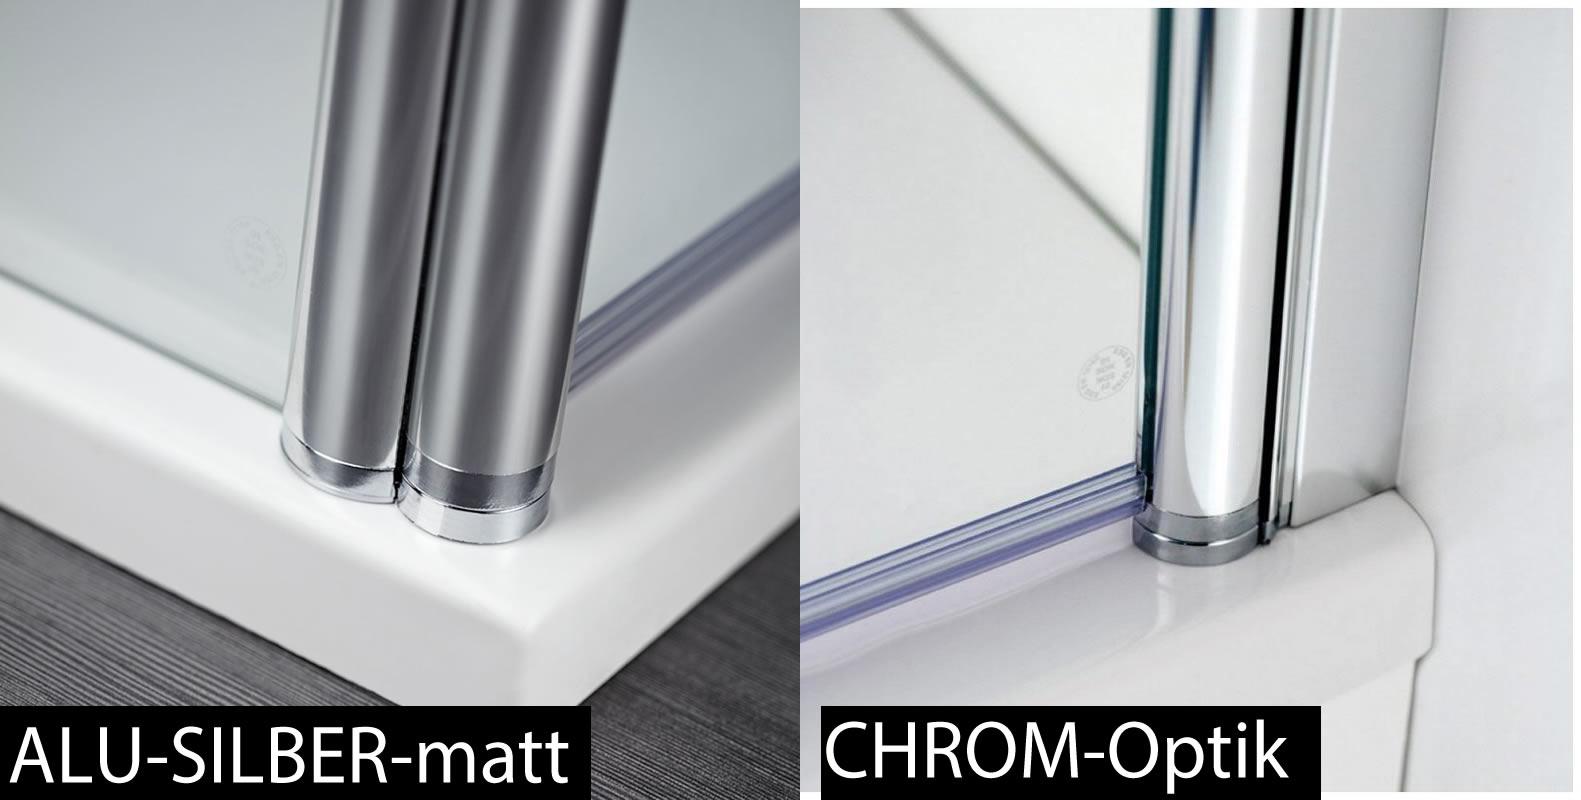 hsk exklusiv badewanennaufsatz 2 teilig 140 cm h he variante rechts chromoptik impulsbad. Black Bedroom Furniture Sets. Home Design Ideas